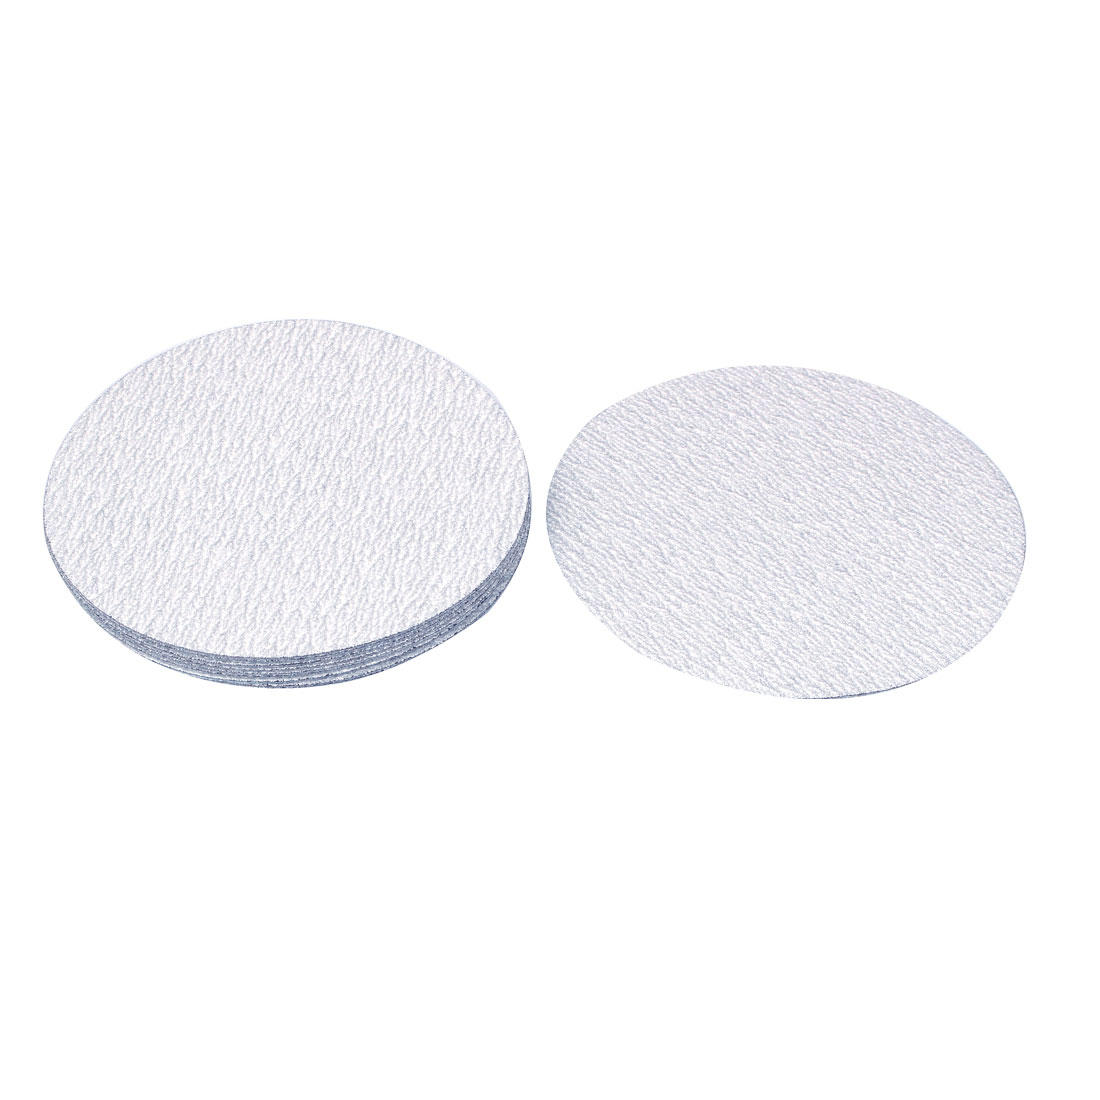 5inch Dia Dry Abrasive Sanding Flocking Sandpaper Sheet Disc 240 Grit 10 Pcs